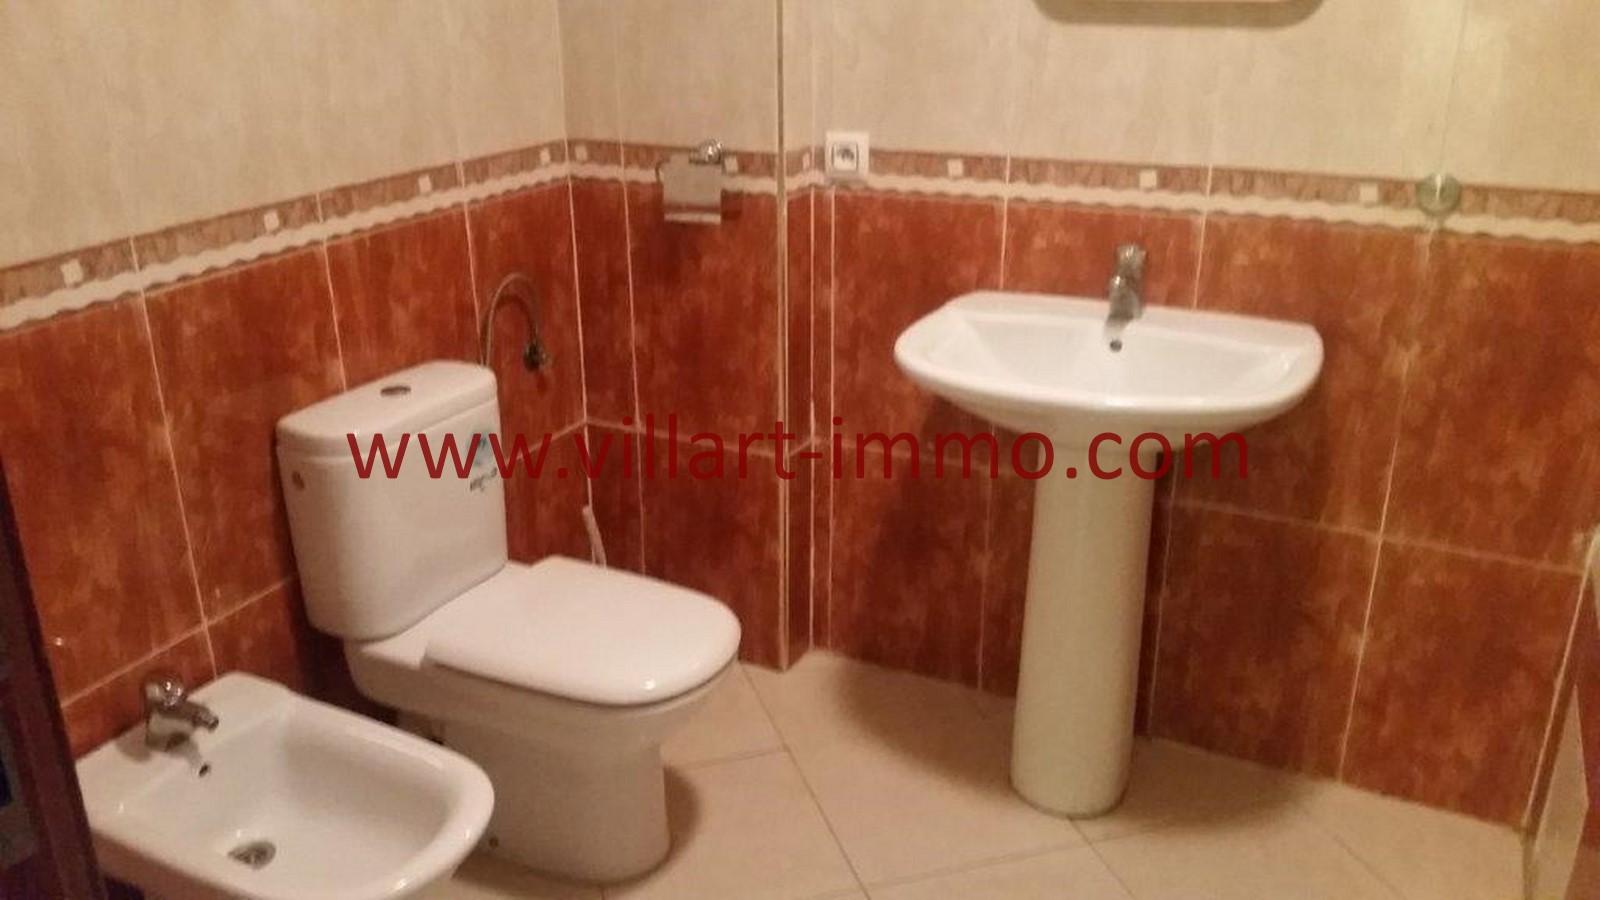 7-A louer-Tanger-Appartement-Non meublée-Centre ville-Salle de bain-L1029